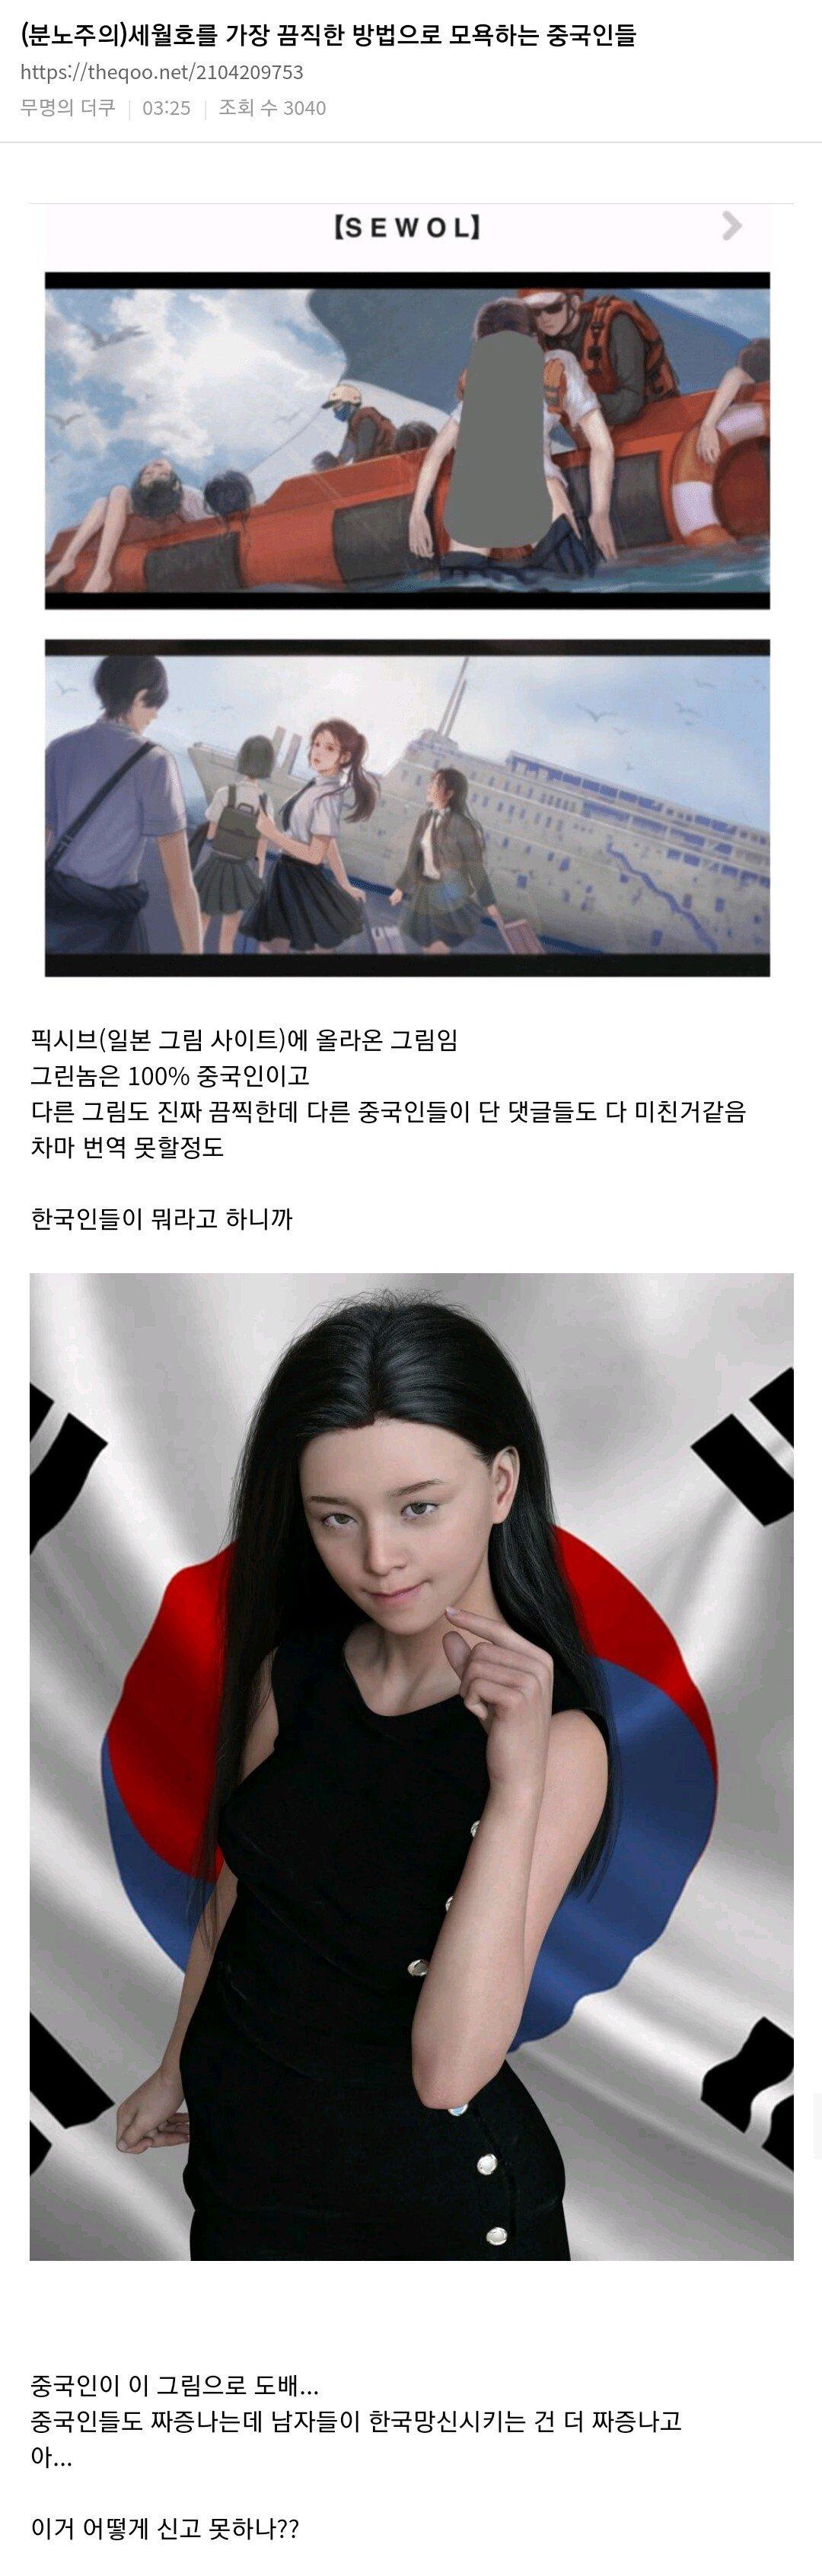 2021-8-4_7-44-13.JPEG 세월호 모독한 중국인 여초반응